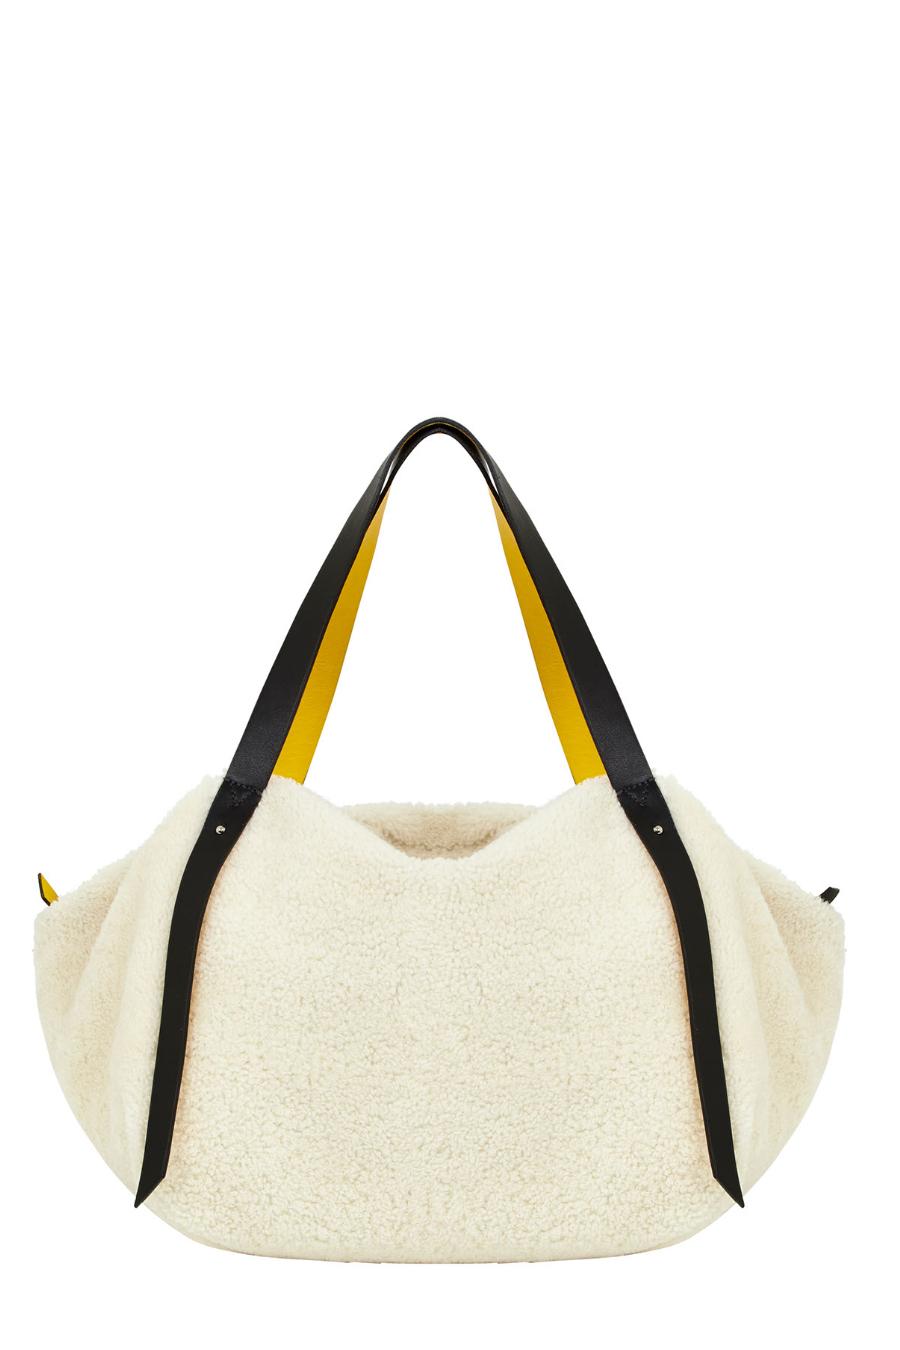 The New Season Shearling Bags - blog post - shoulder bag - white